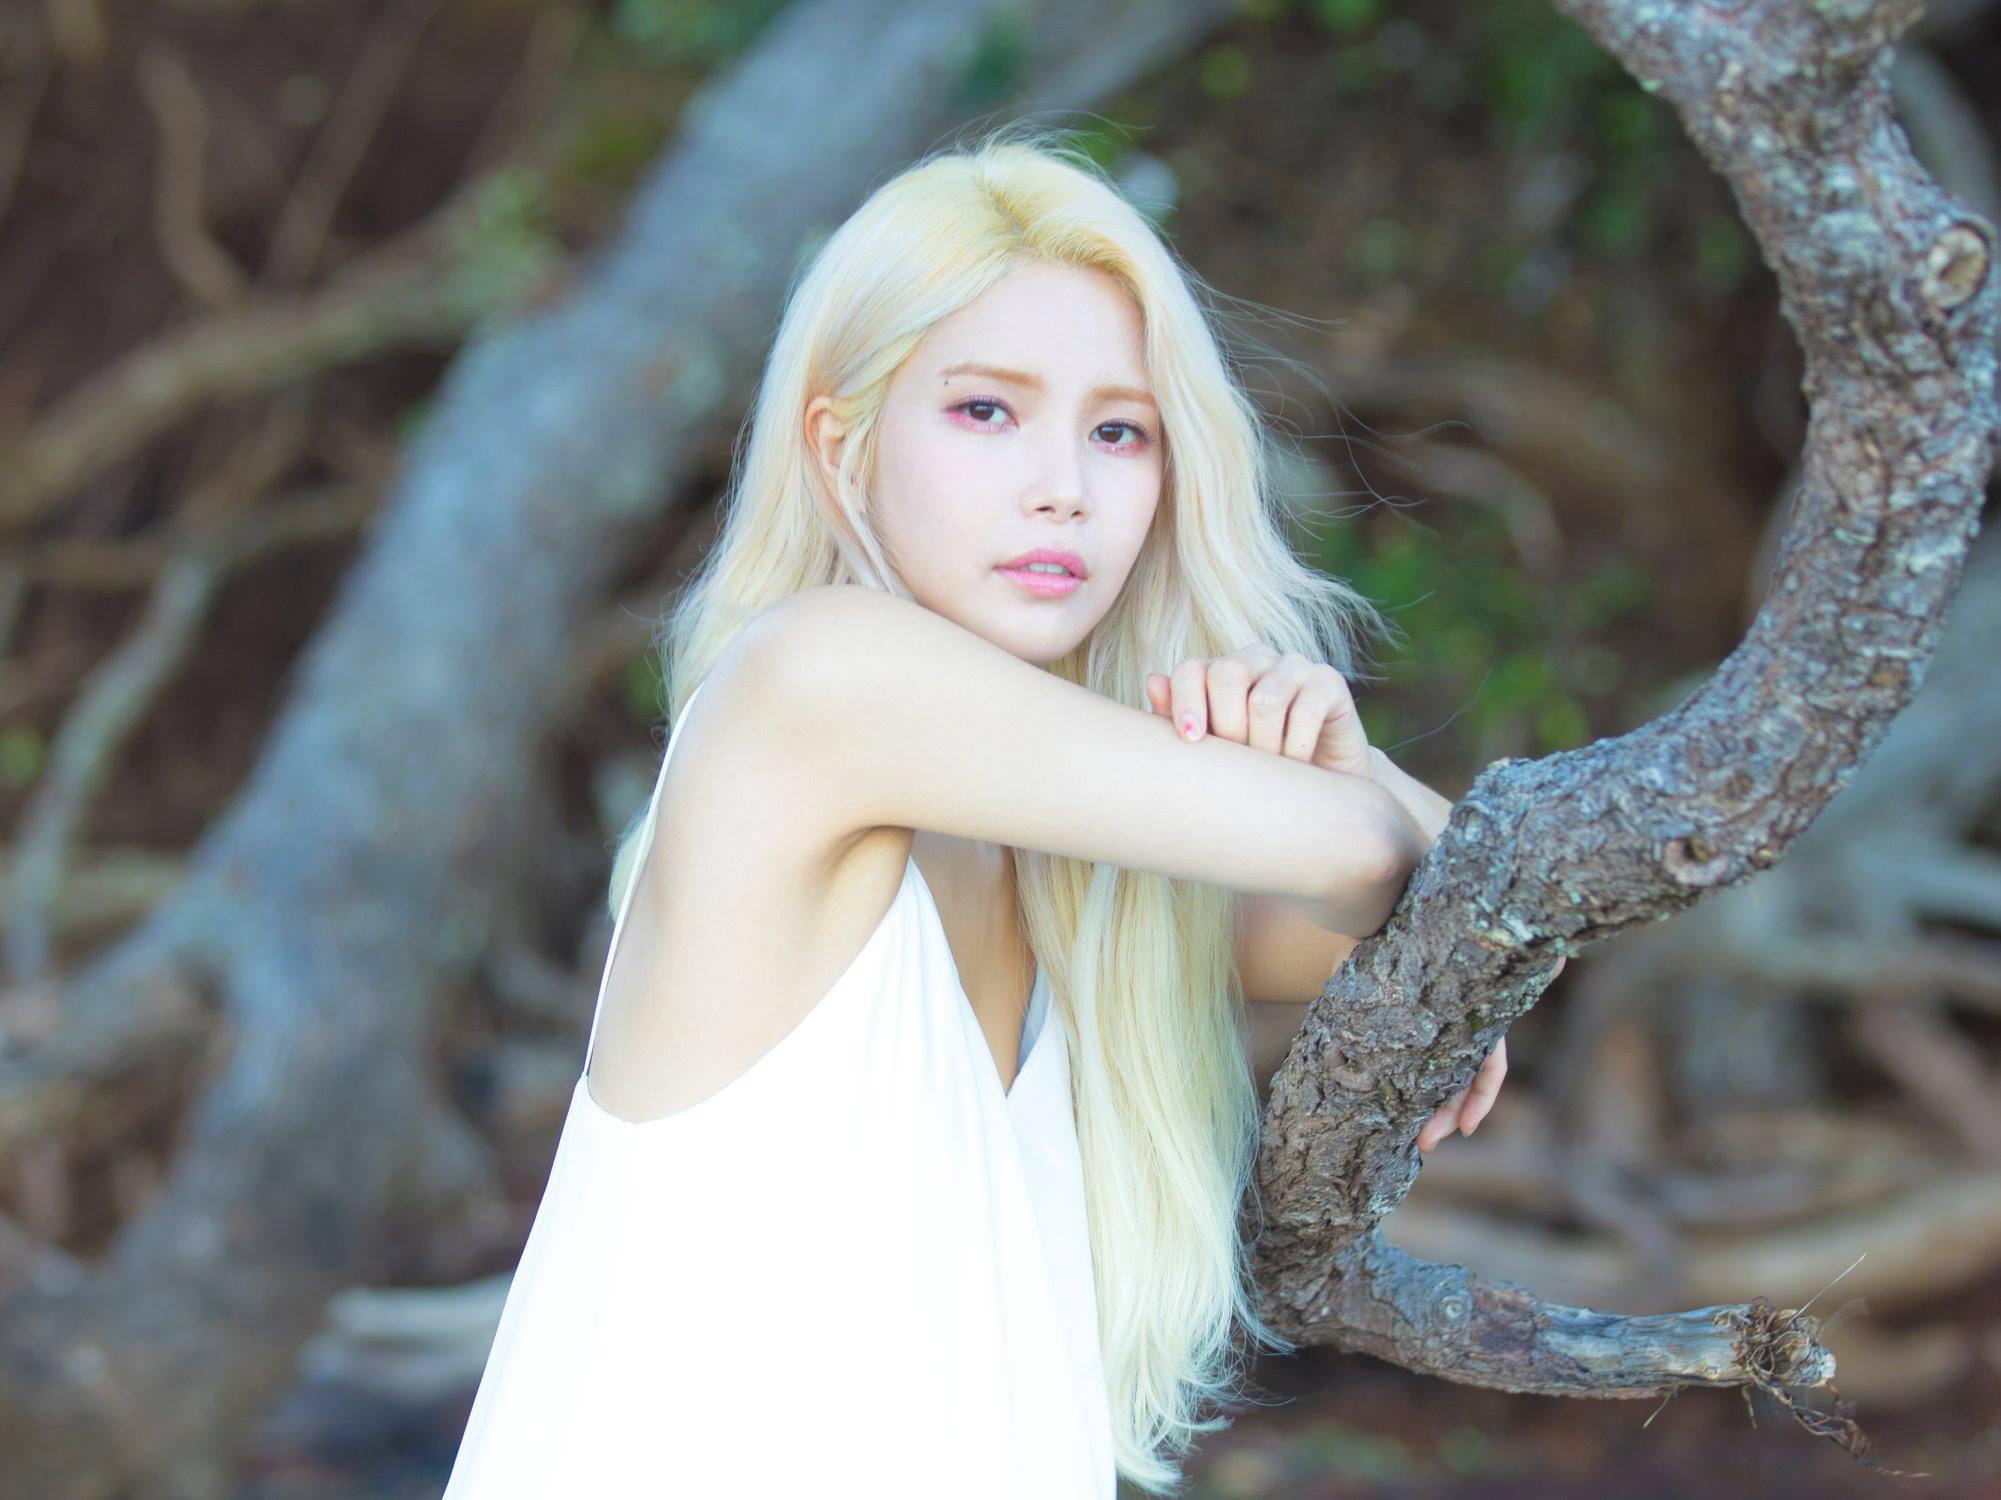 Image Mamamoo Yellow Flower Comeback Teaser 3 Solarg Kpop